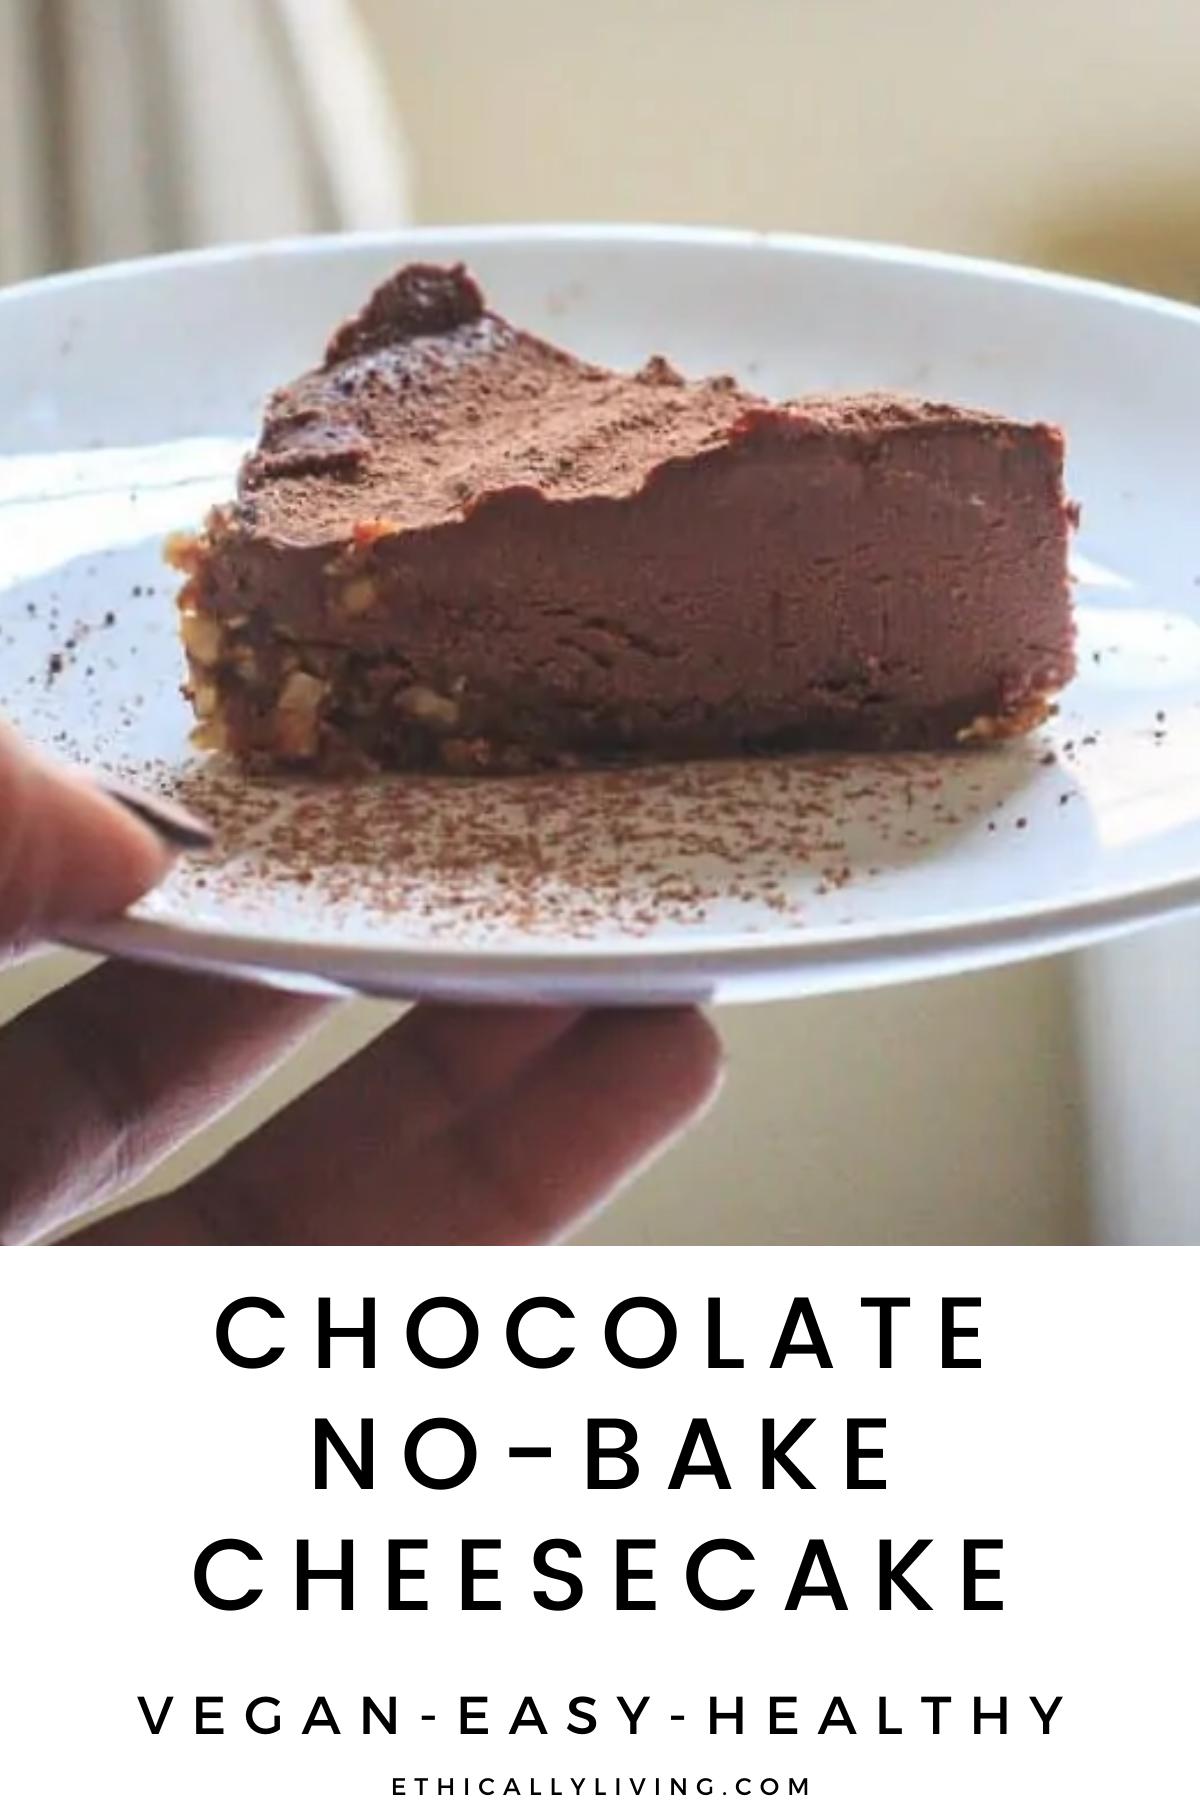 Vegan Chocolate No Bake Cheesecake Ethically Living Recipe In 2020 Baking Vegan Chocolate Food